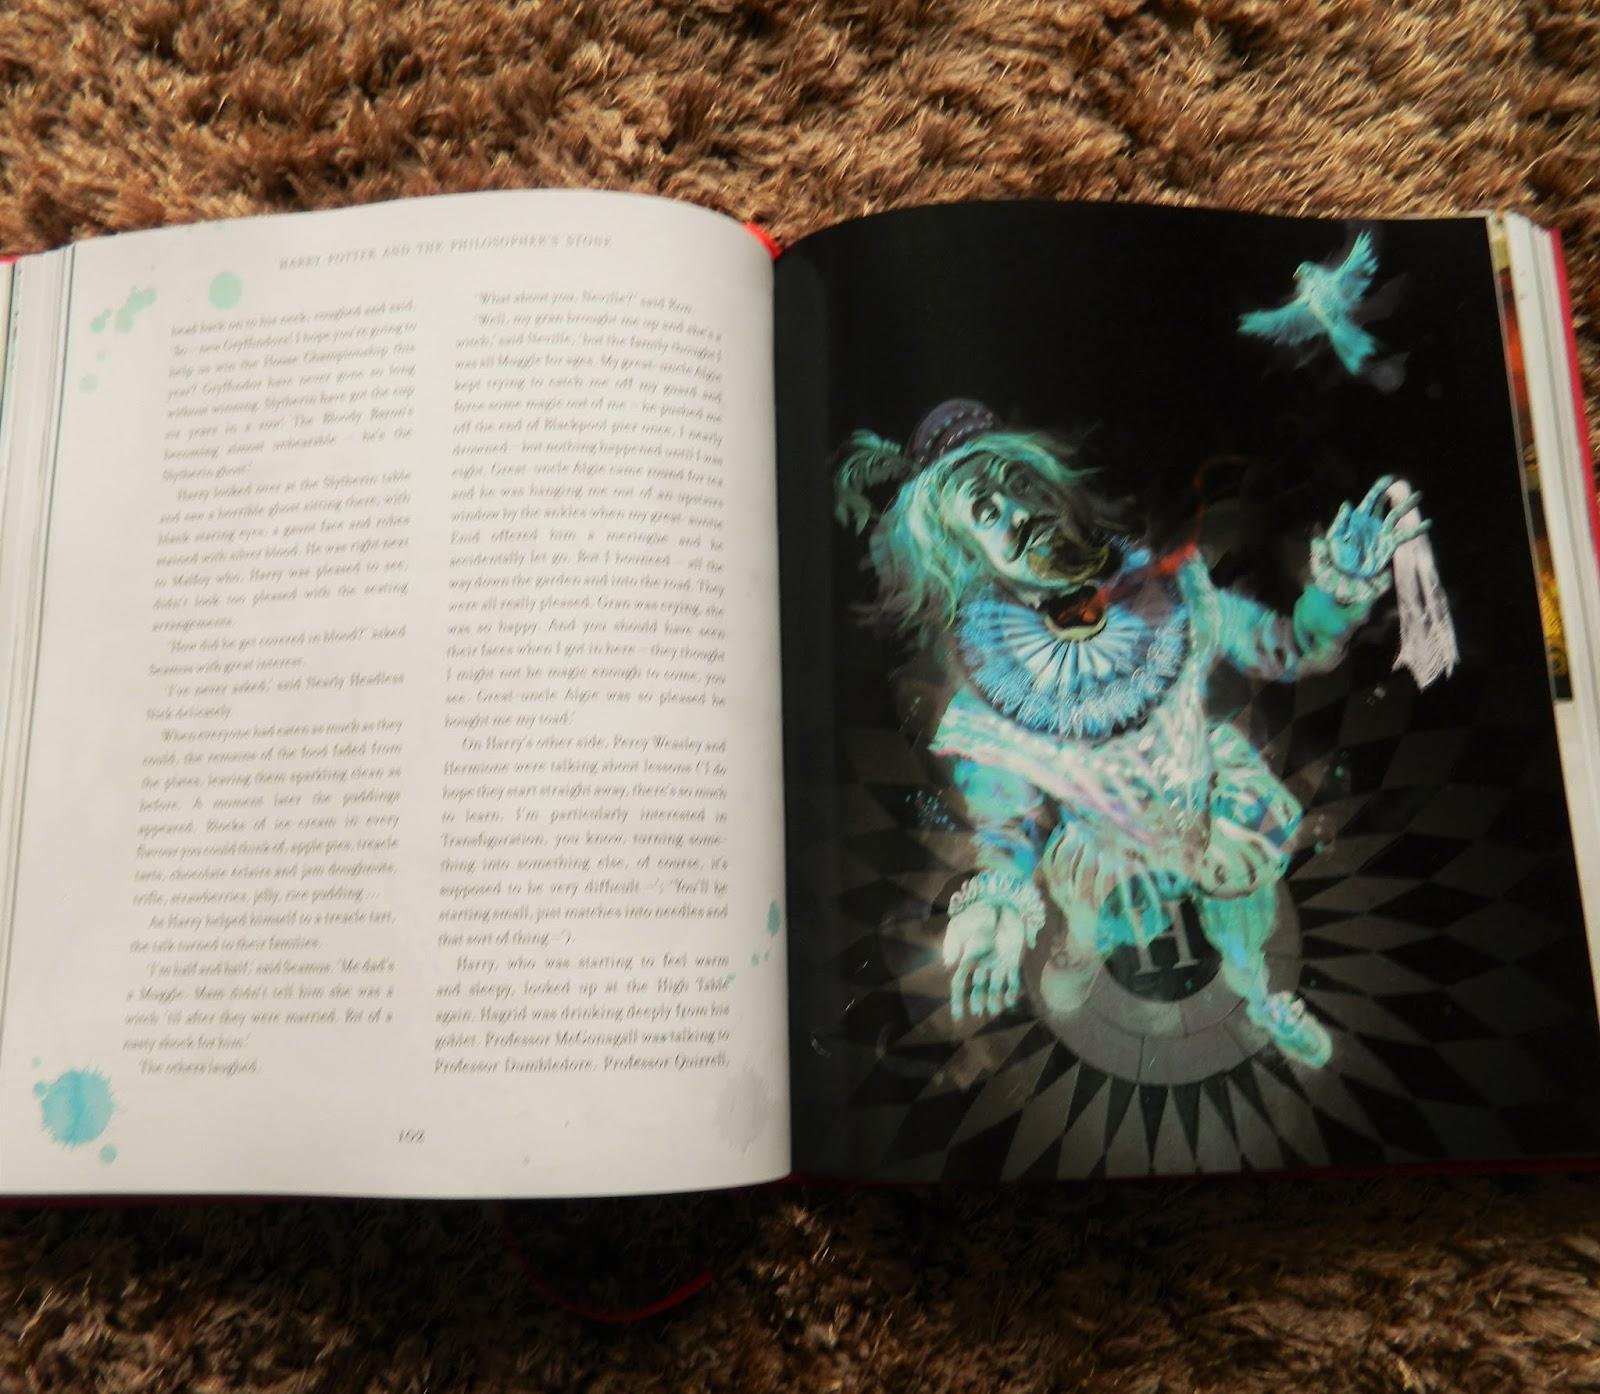 Harry Potter É A Pedra Filosofal throughout descobrindo: harry potter e a pedra filosofal - edição ilustrada